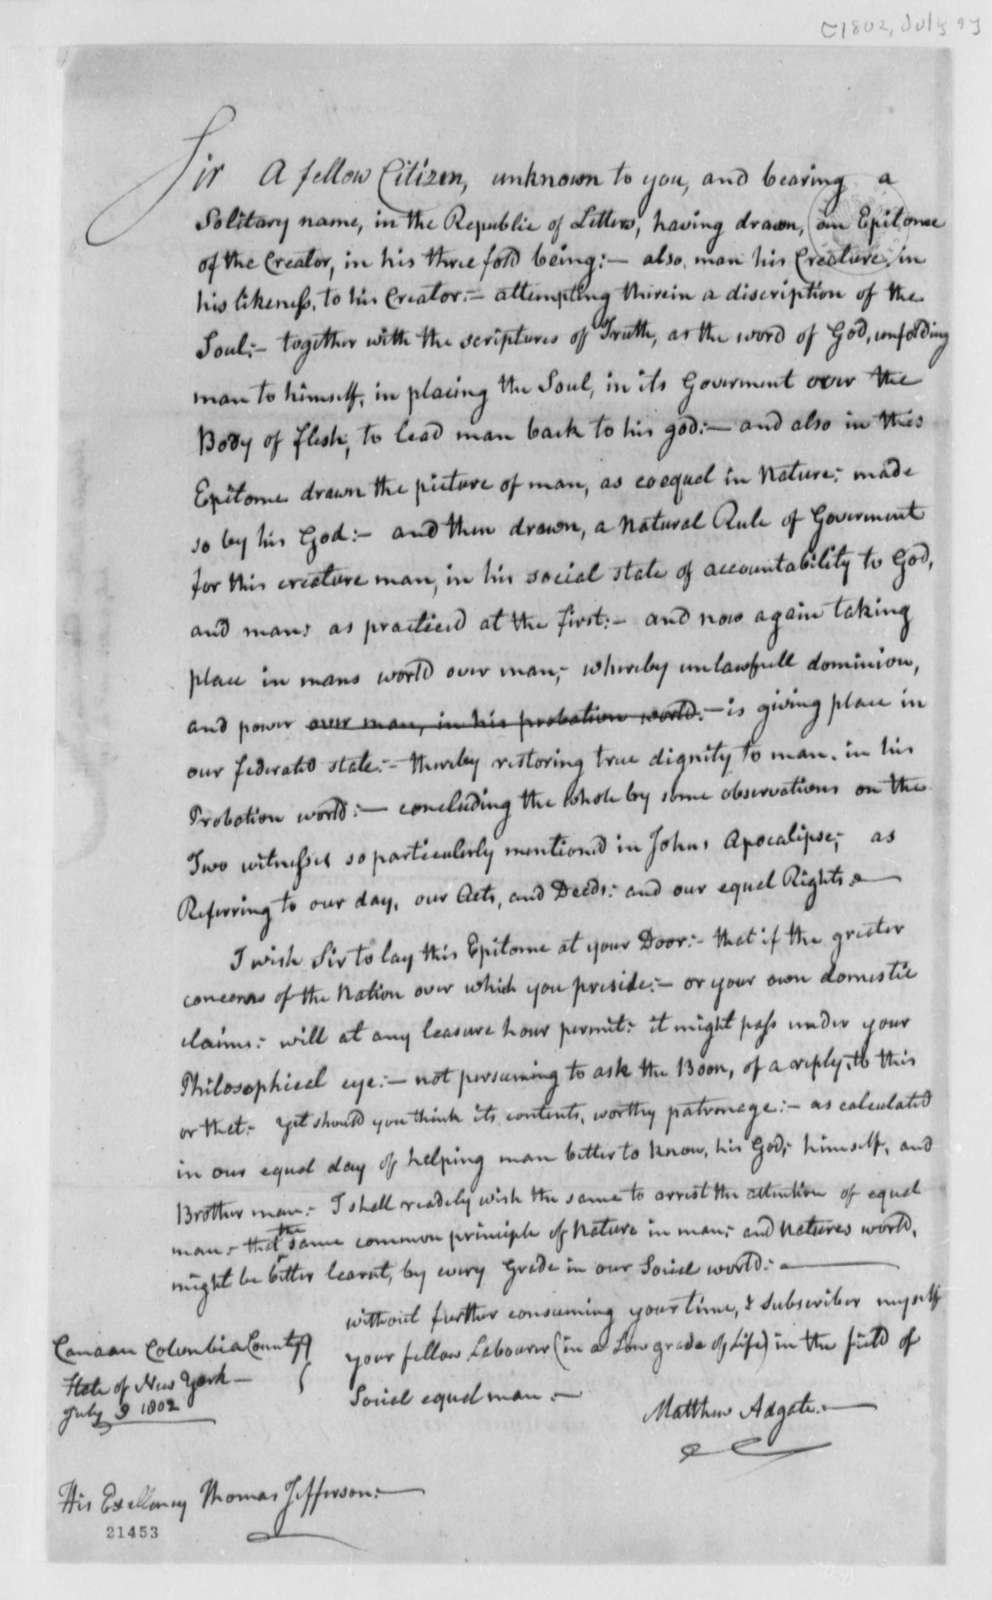 Matthew Adgate to Thomas Jefferson, July 9, 1802